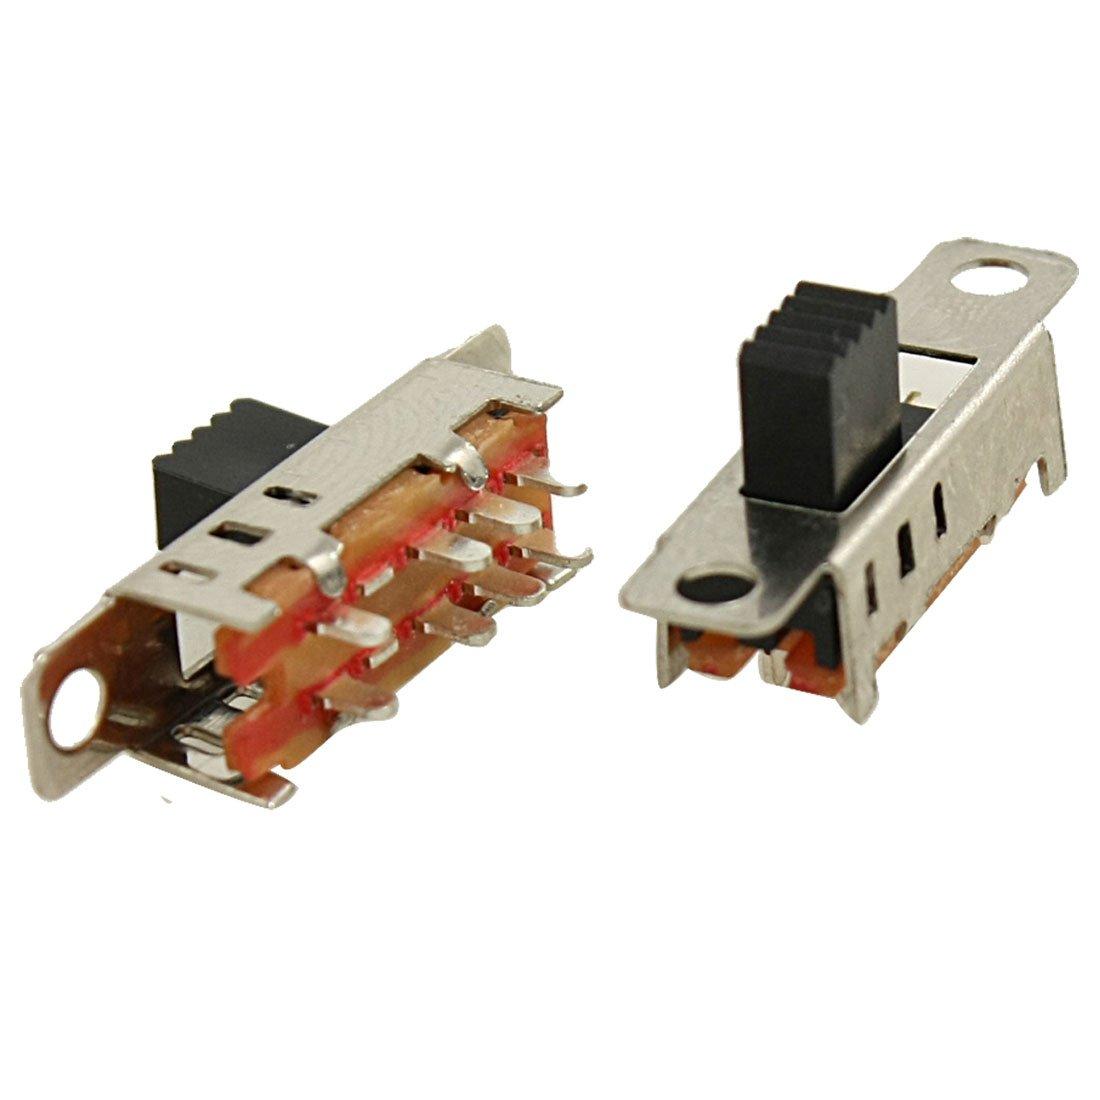 5 Pcs 8 Pin Pcb 3 Position On Dp3t 2p3t Panel Mini 4 Way Slide Switch Wiring Diagram Ss23e04 G5 Home Improvement